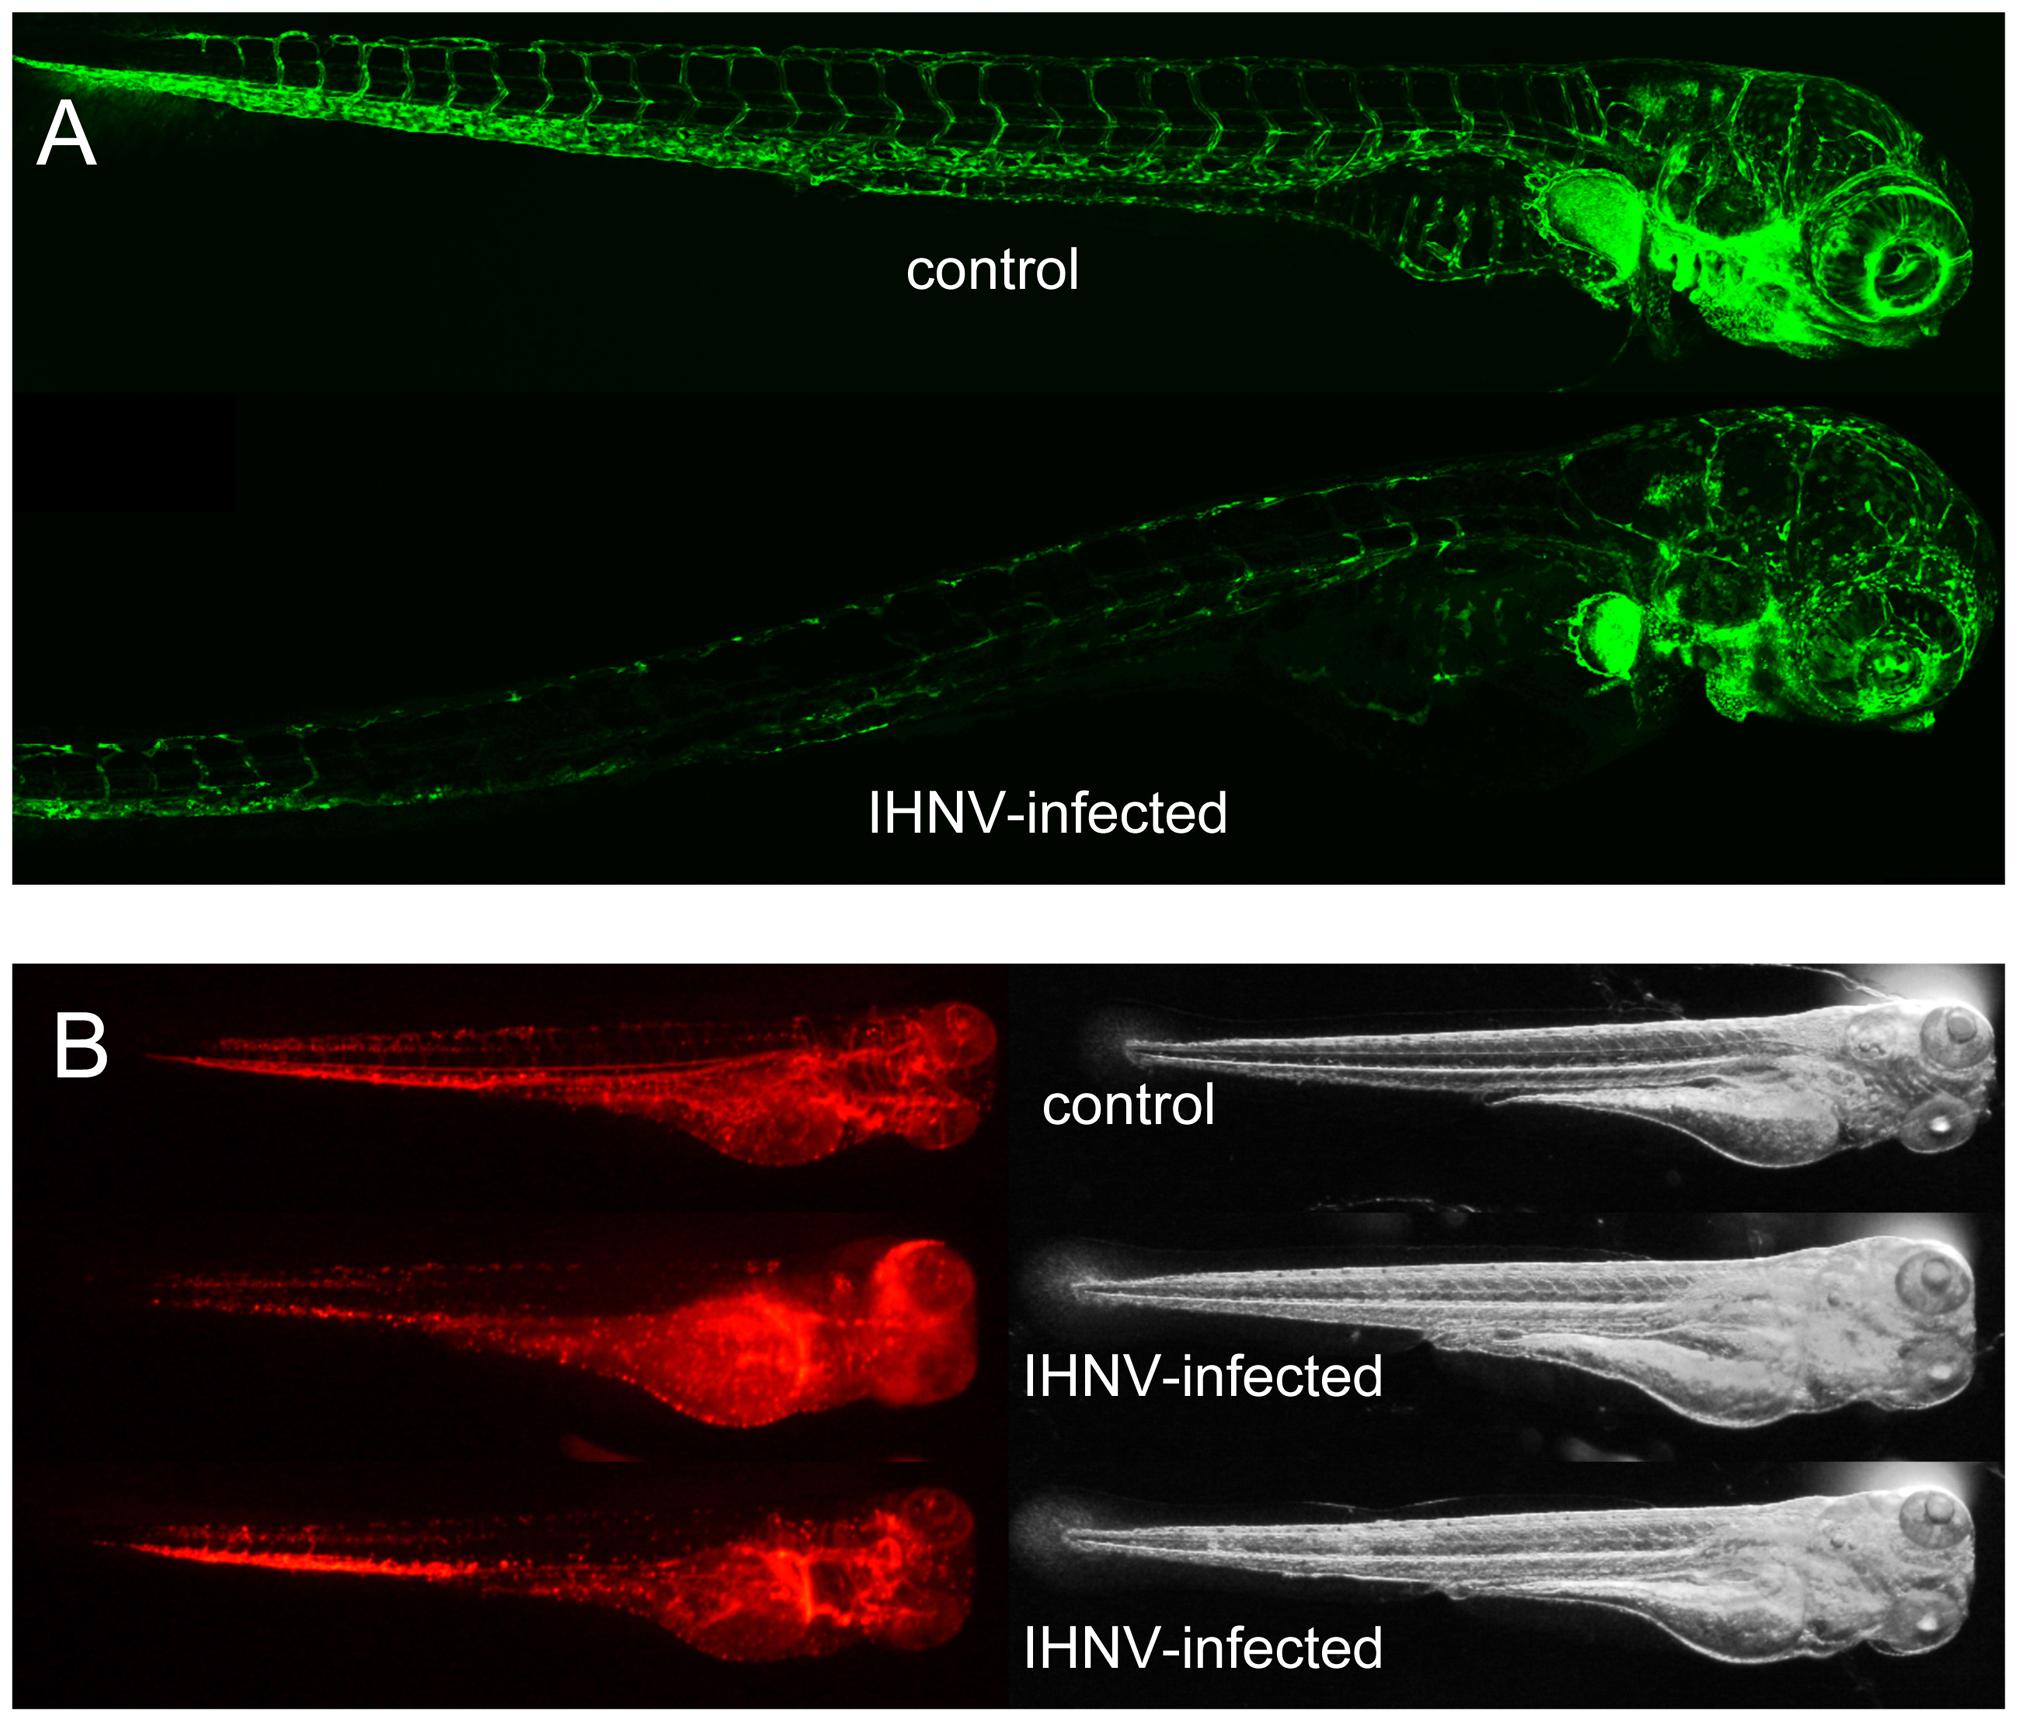 IHNV infection destroys vascular endothelium but not erythrocytes.